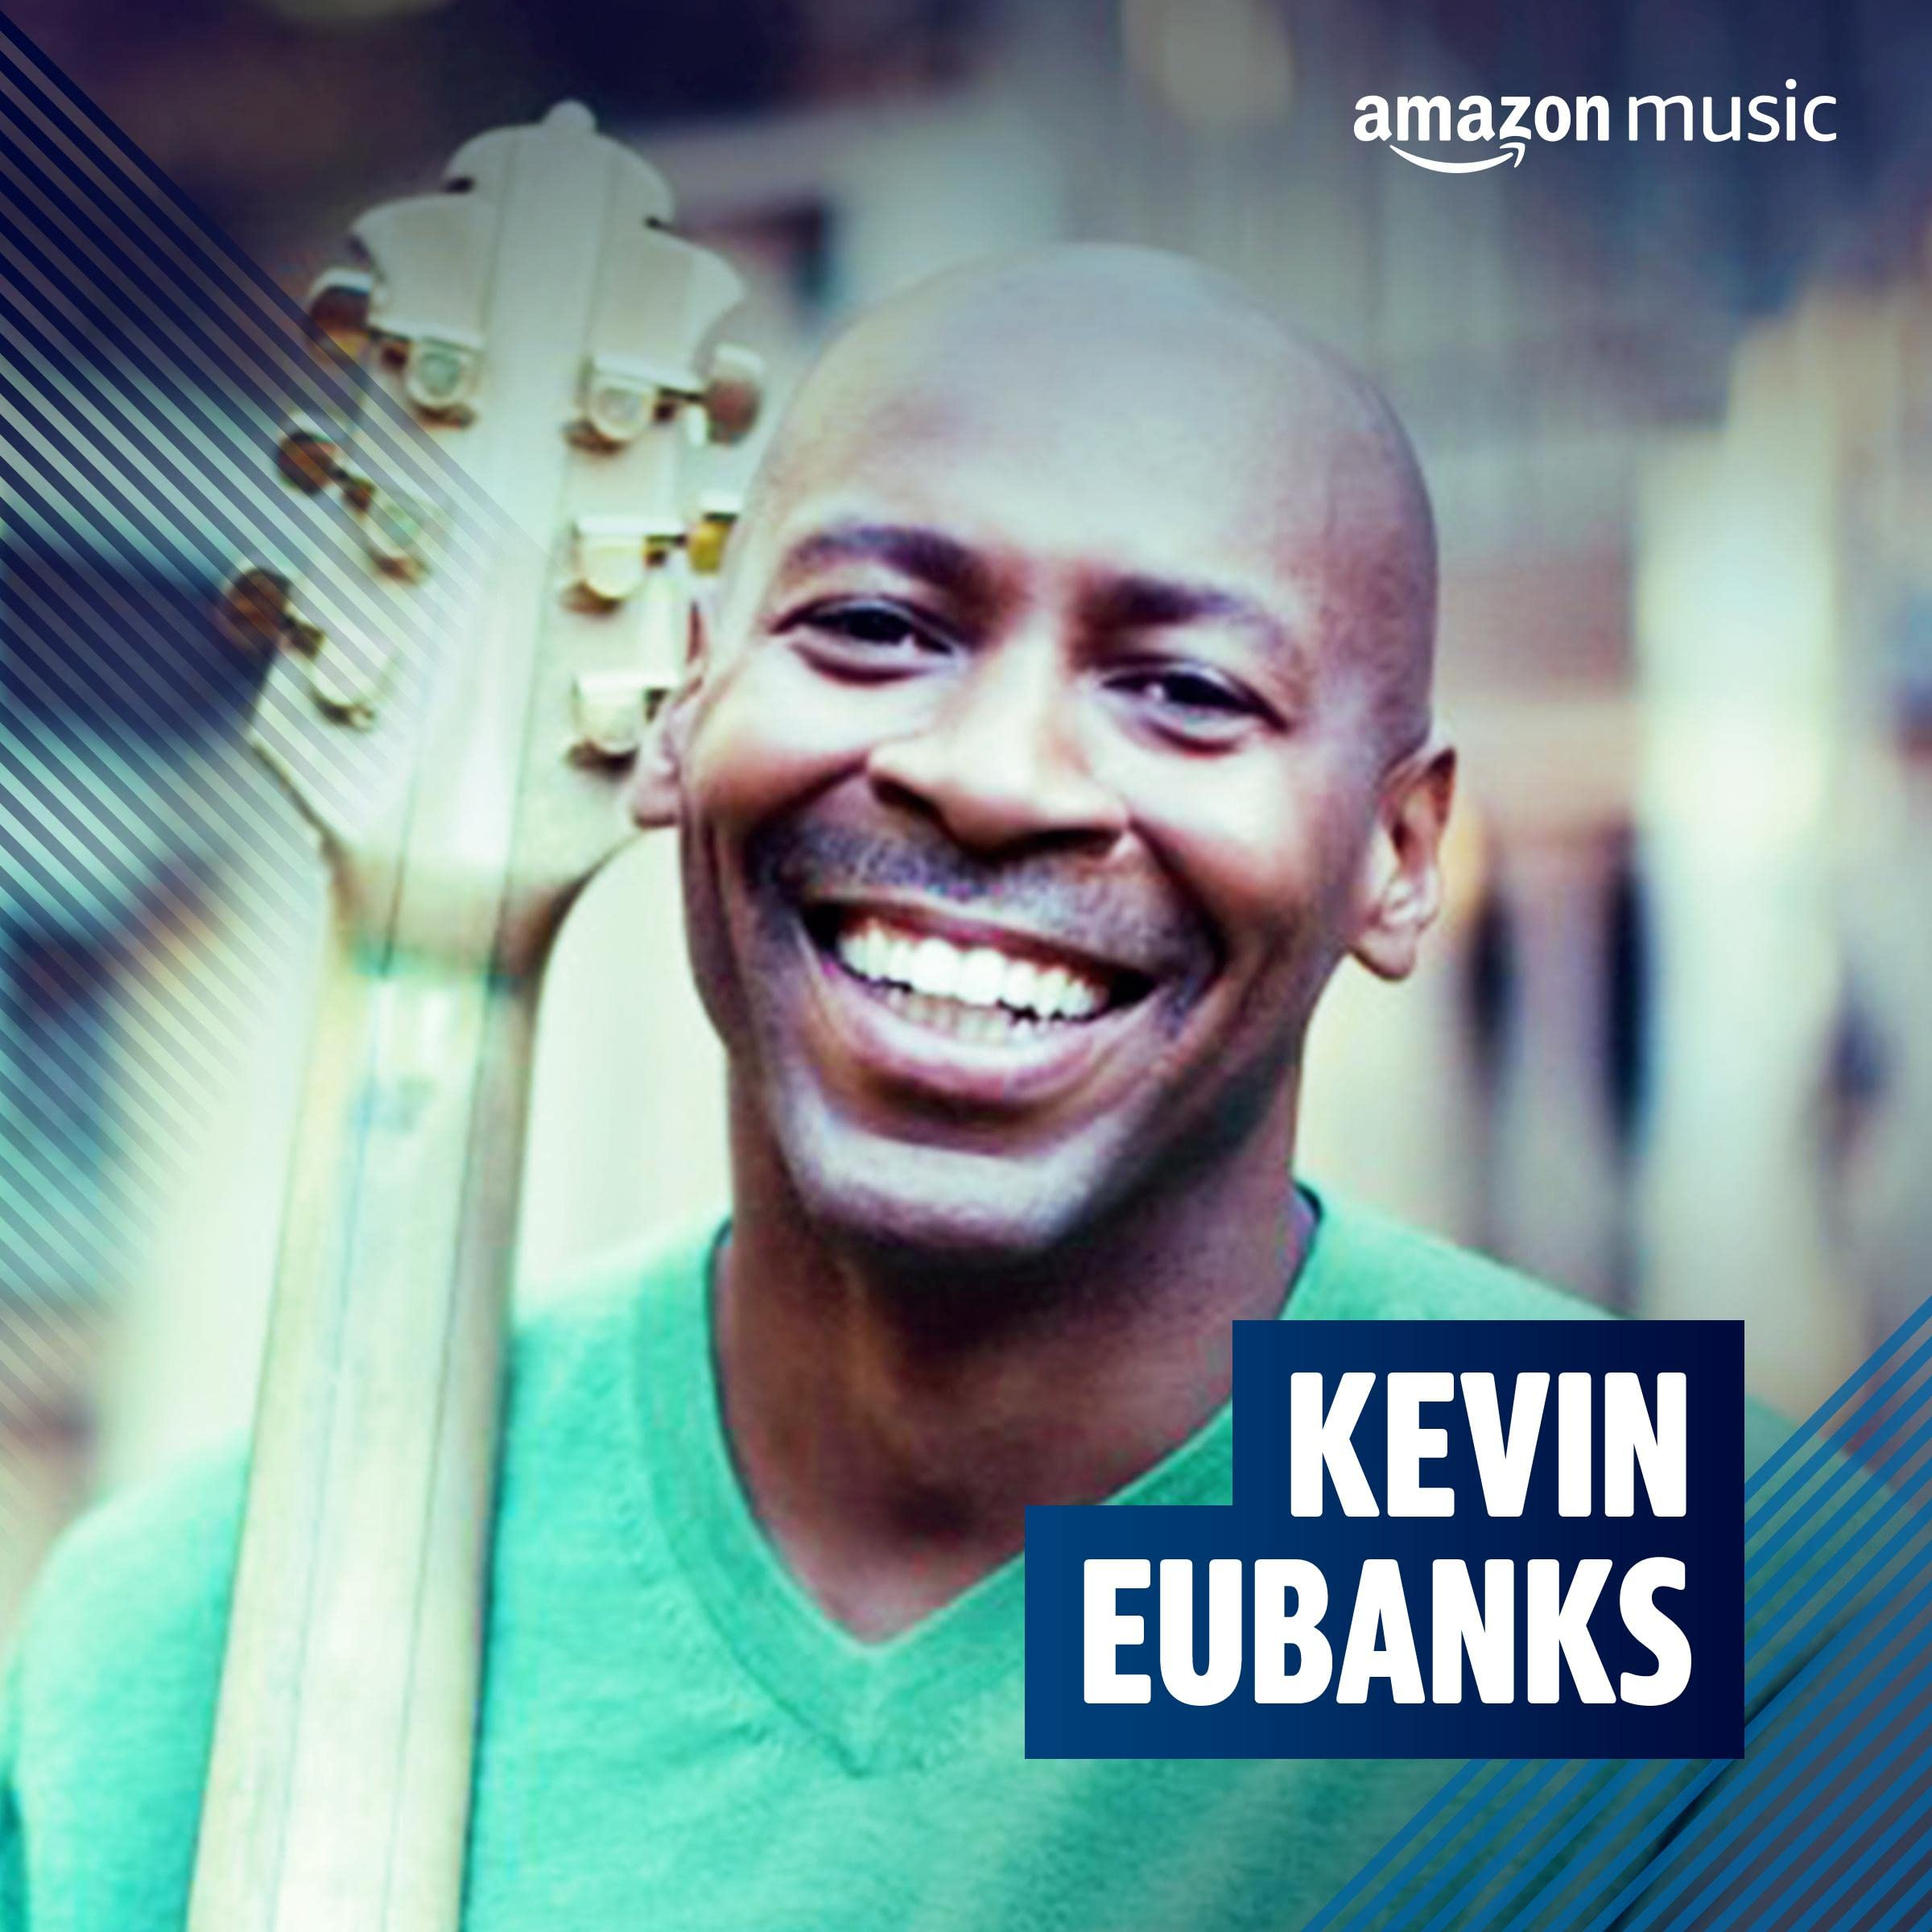 Kevin Eubanks